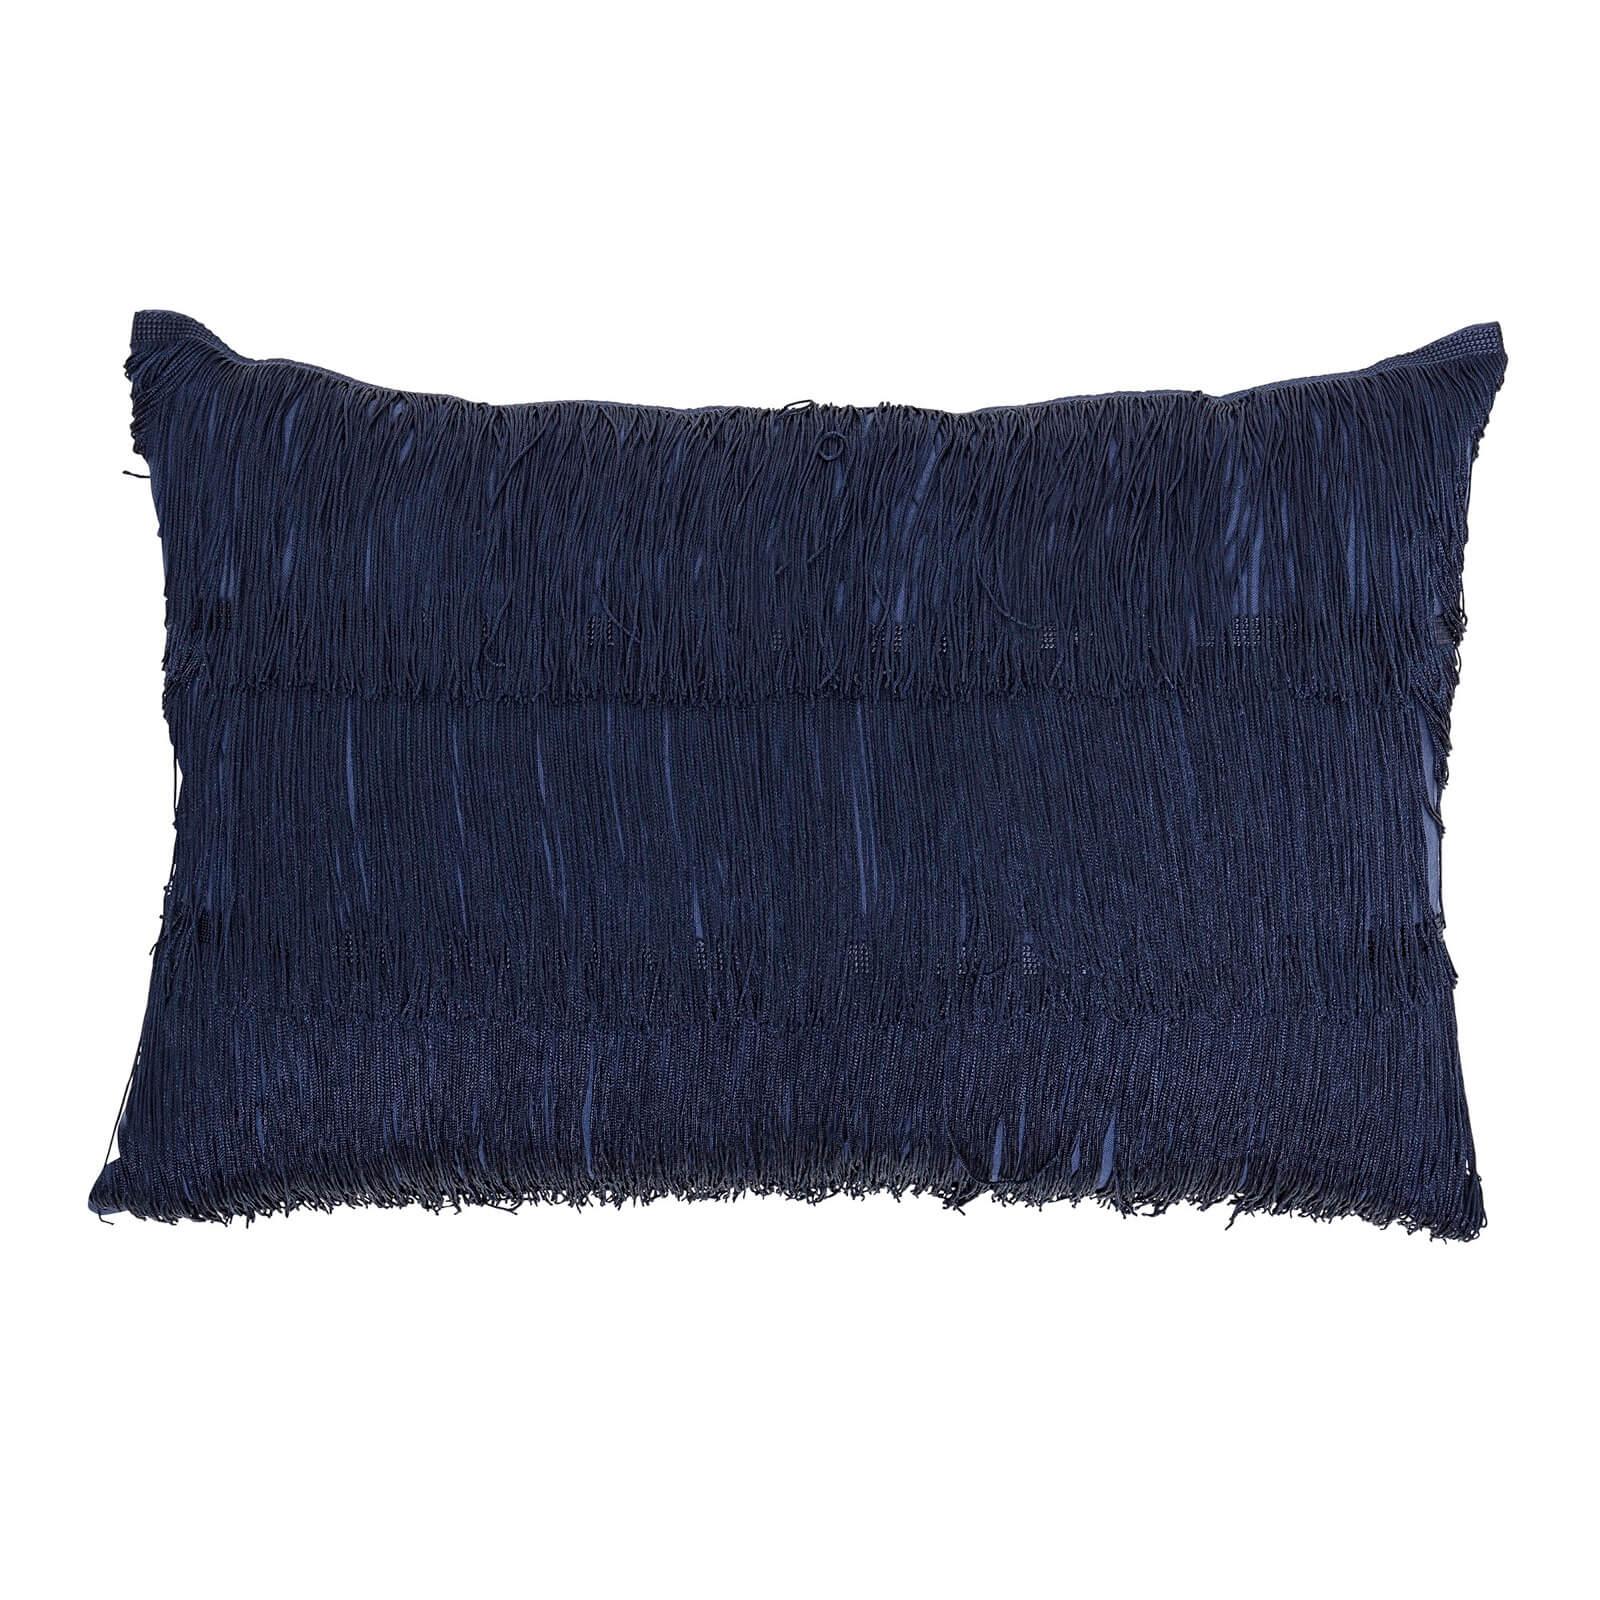 Bloomingville Fringe Detail Cushion - Blue